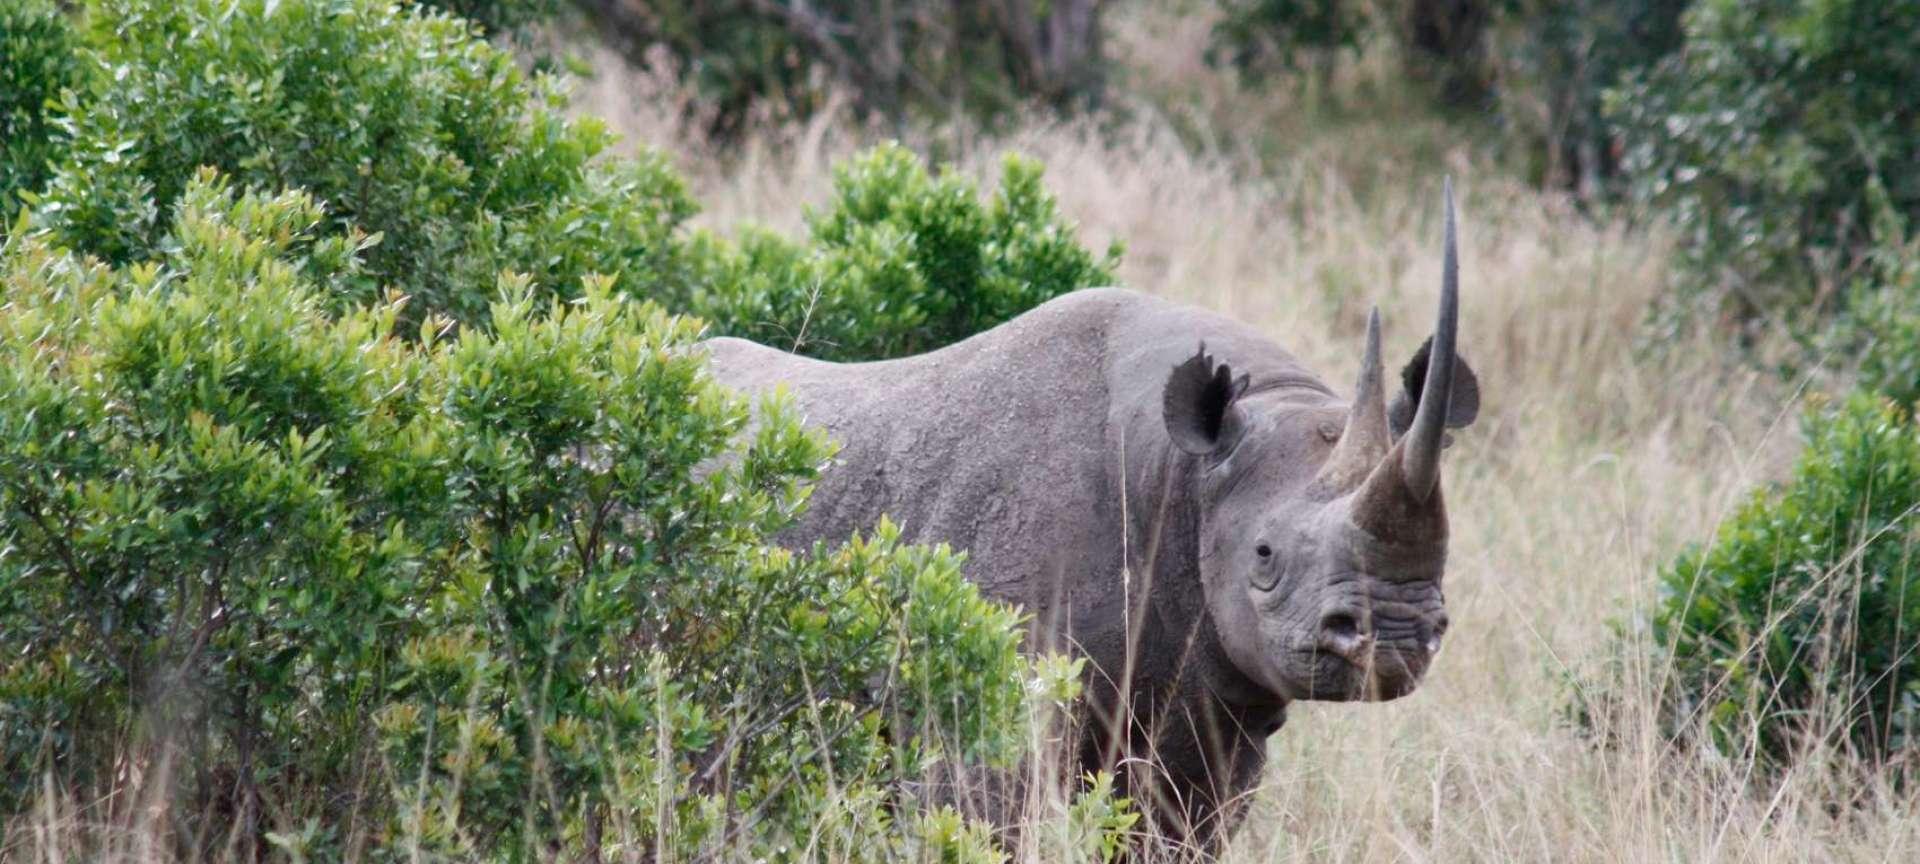 Rhino safari in Kenya - Africa Wildlife Safaris